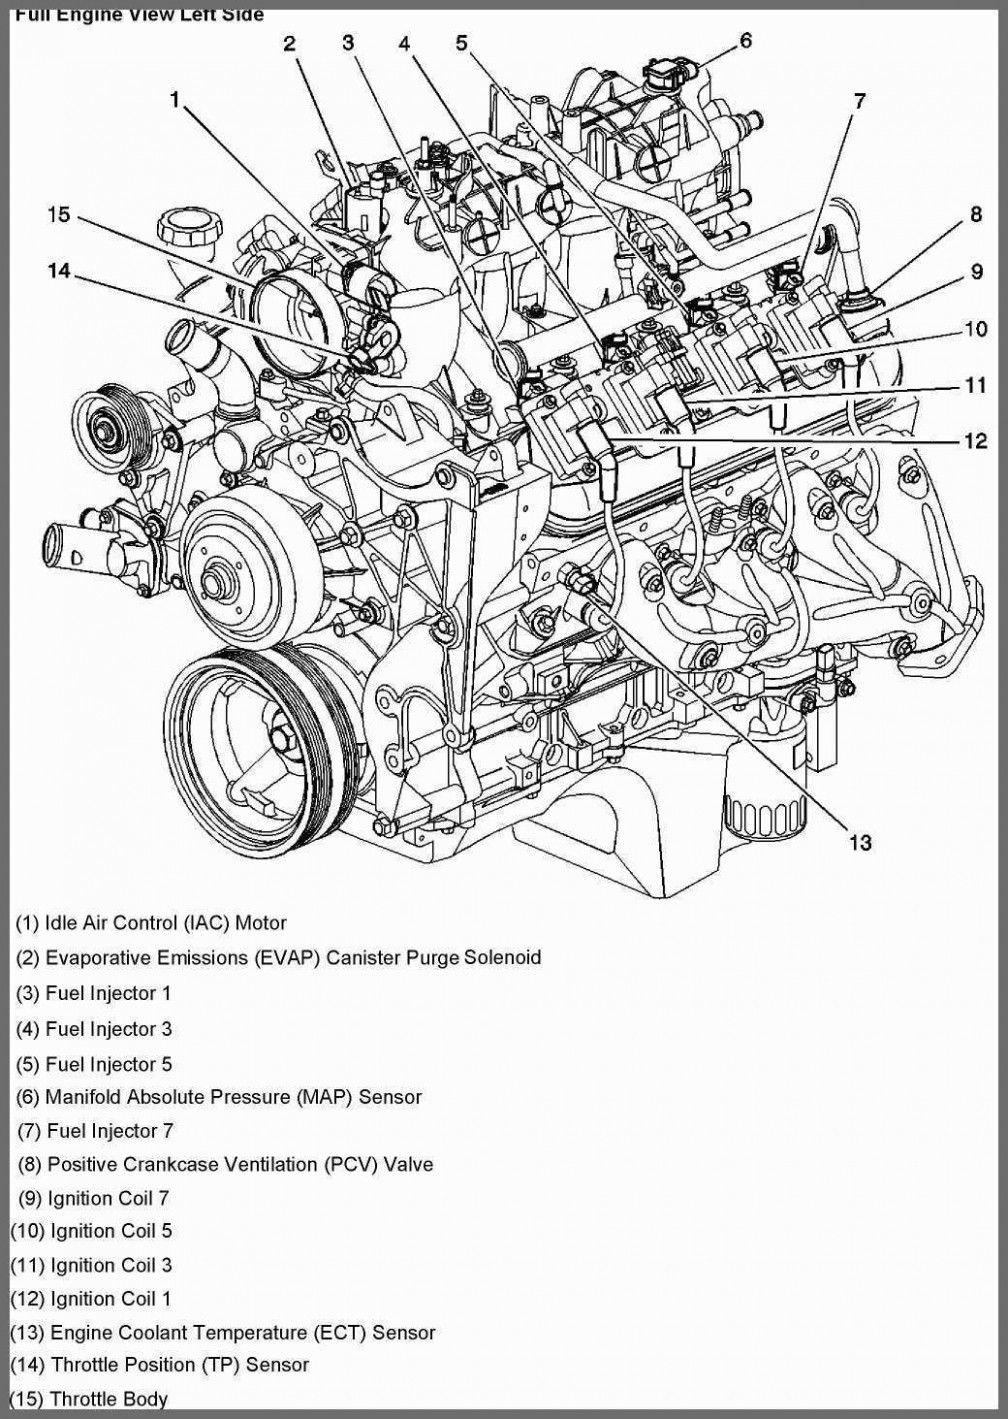 Chevy 4.3 Engine Diagram : chevy, engine, diagram, Chevy, Engine, Diagram, Wiring, Export, Stare-enter, Stare-enter.congressosifo2018.it